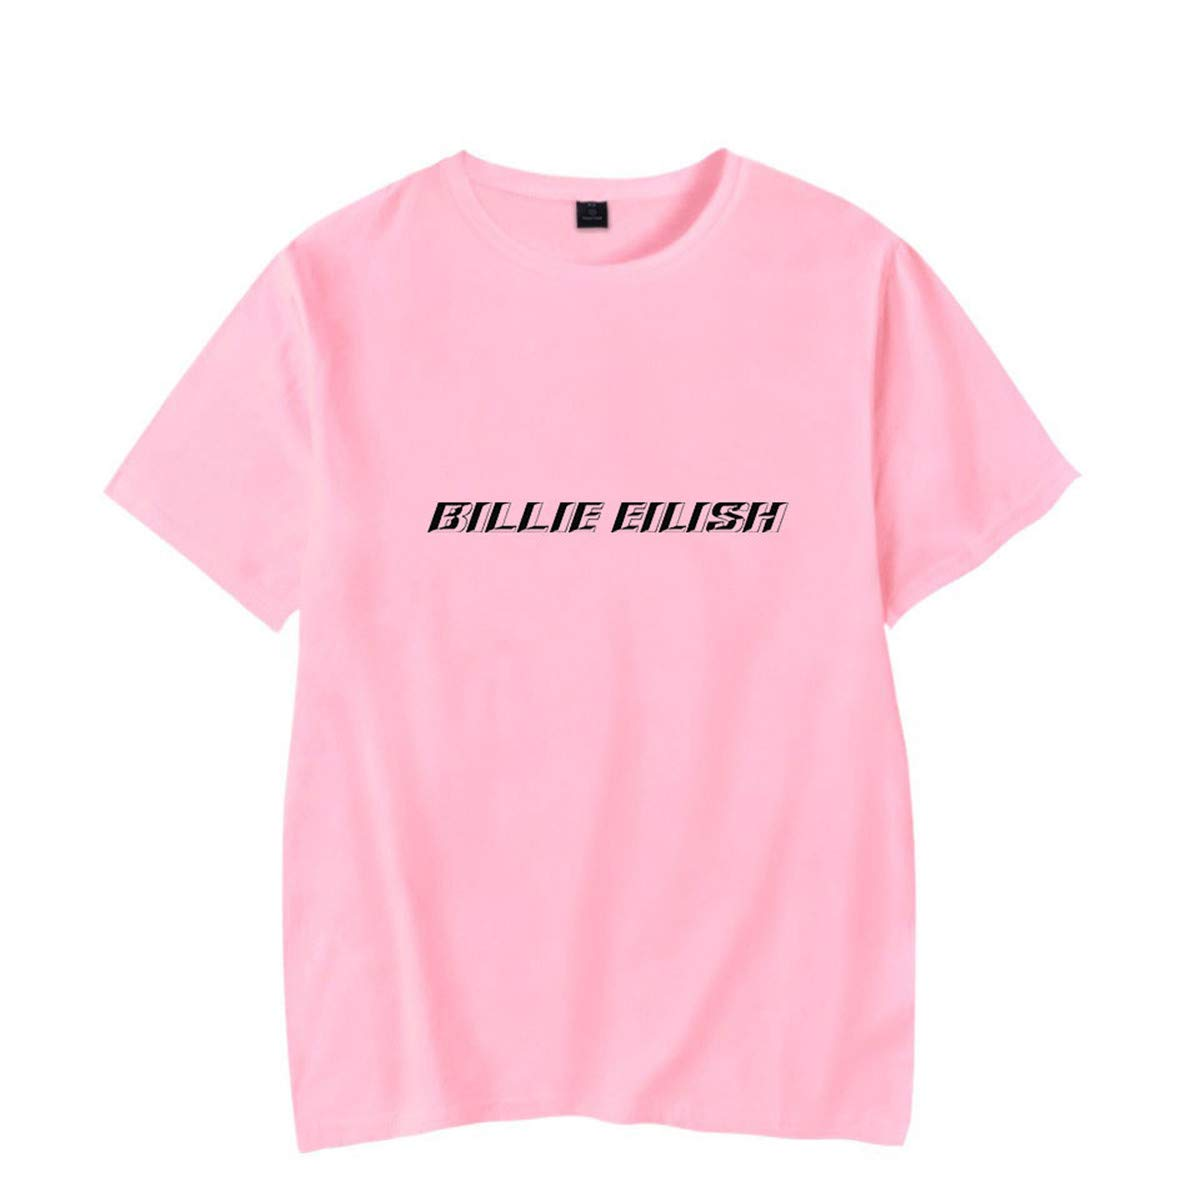 Trend Singer per Billie Eilish Maglietta Bury a Friend Hip Pop Cool Bluse T-Shirt Top Camicetta Maniche Corte per Uomo Donna Teen